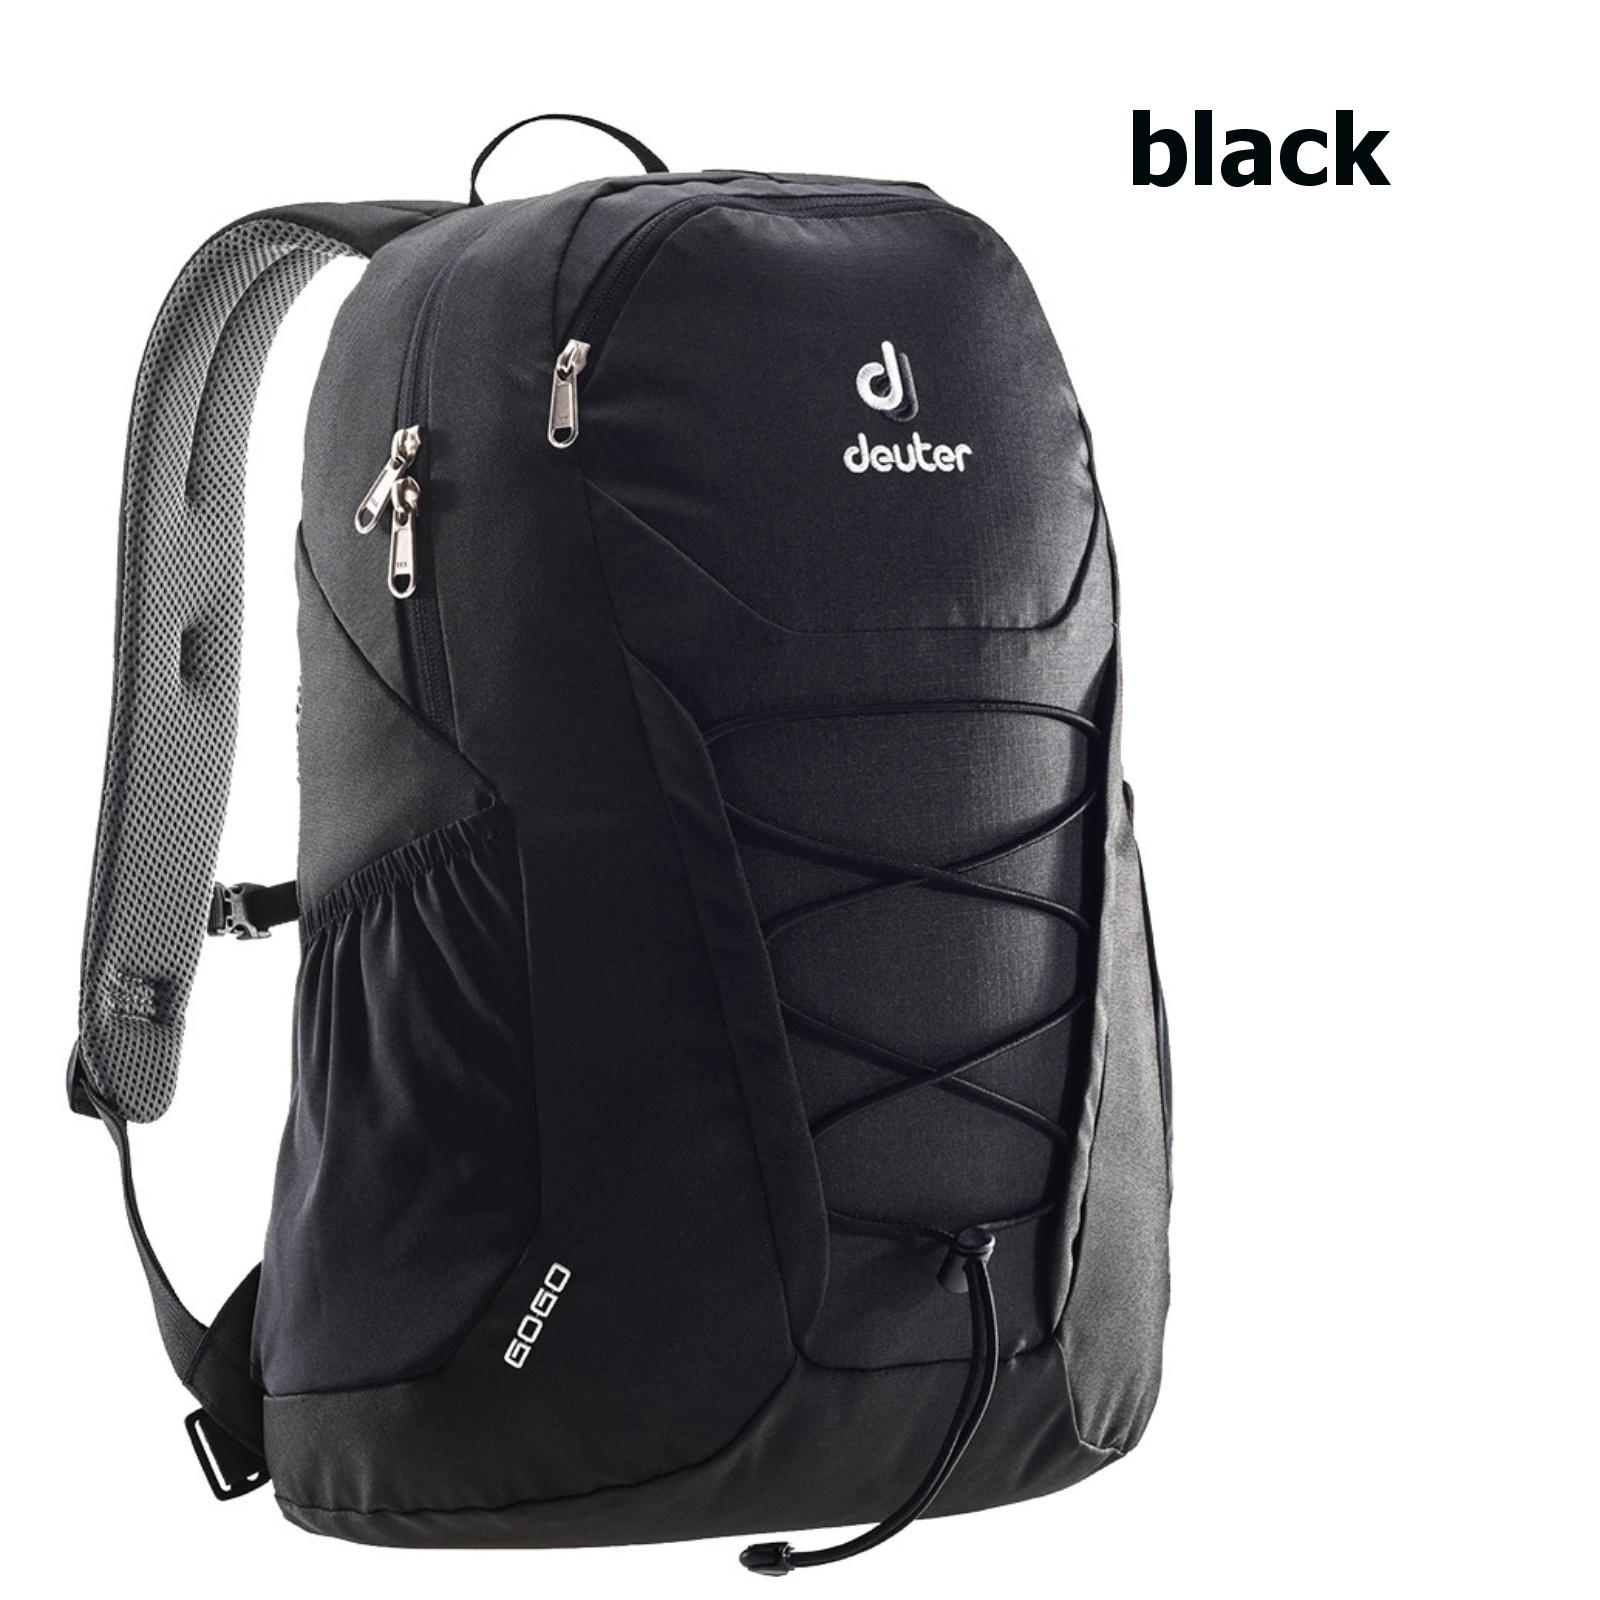 Deuter Gogo 25 black